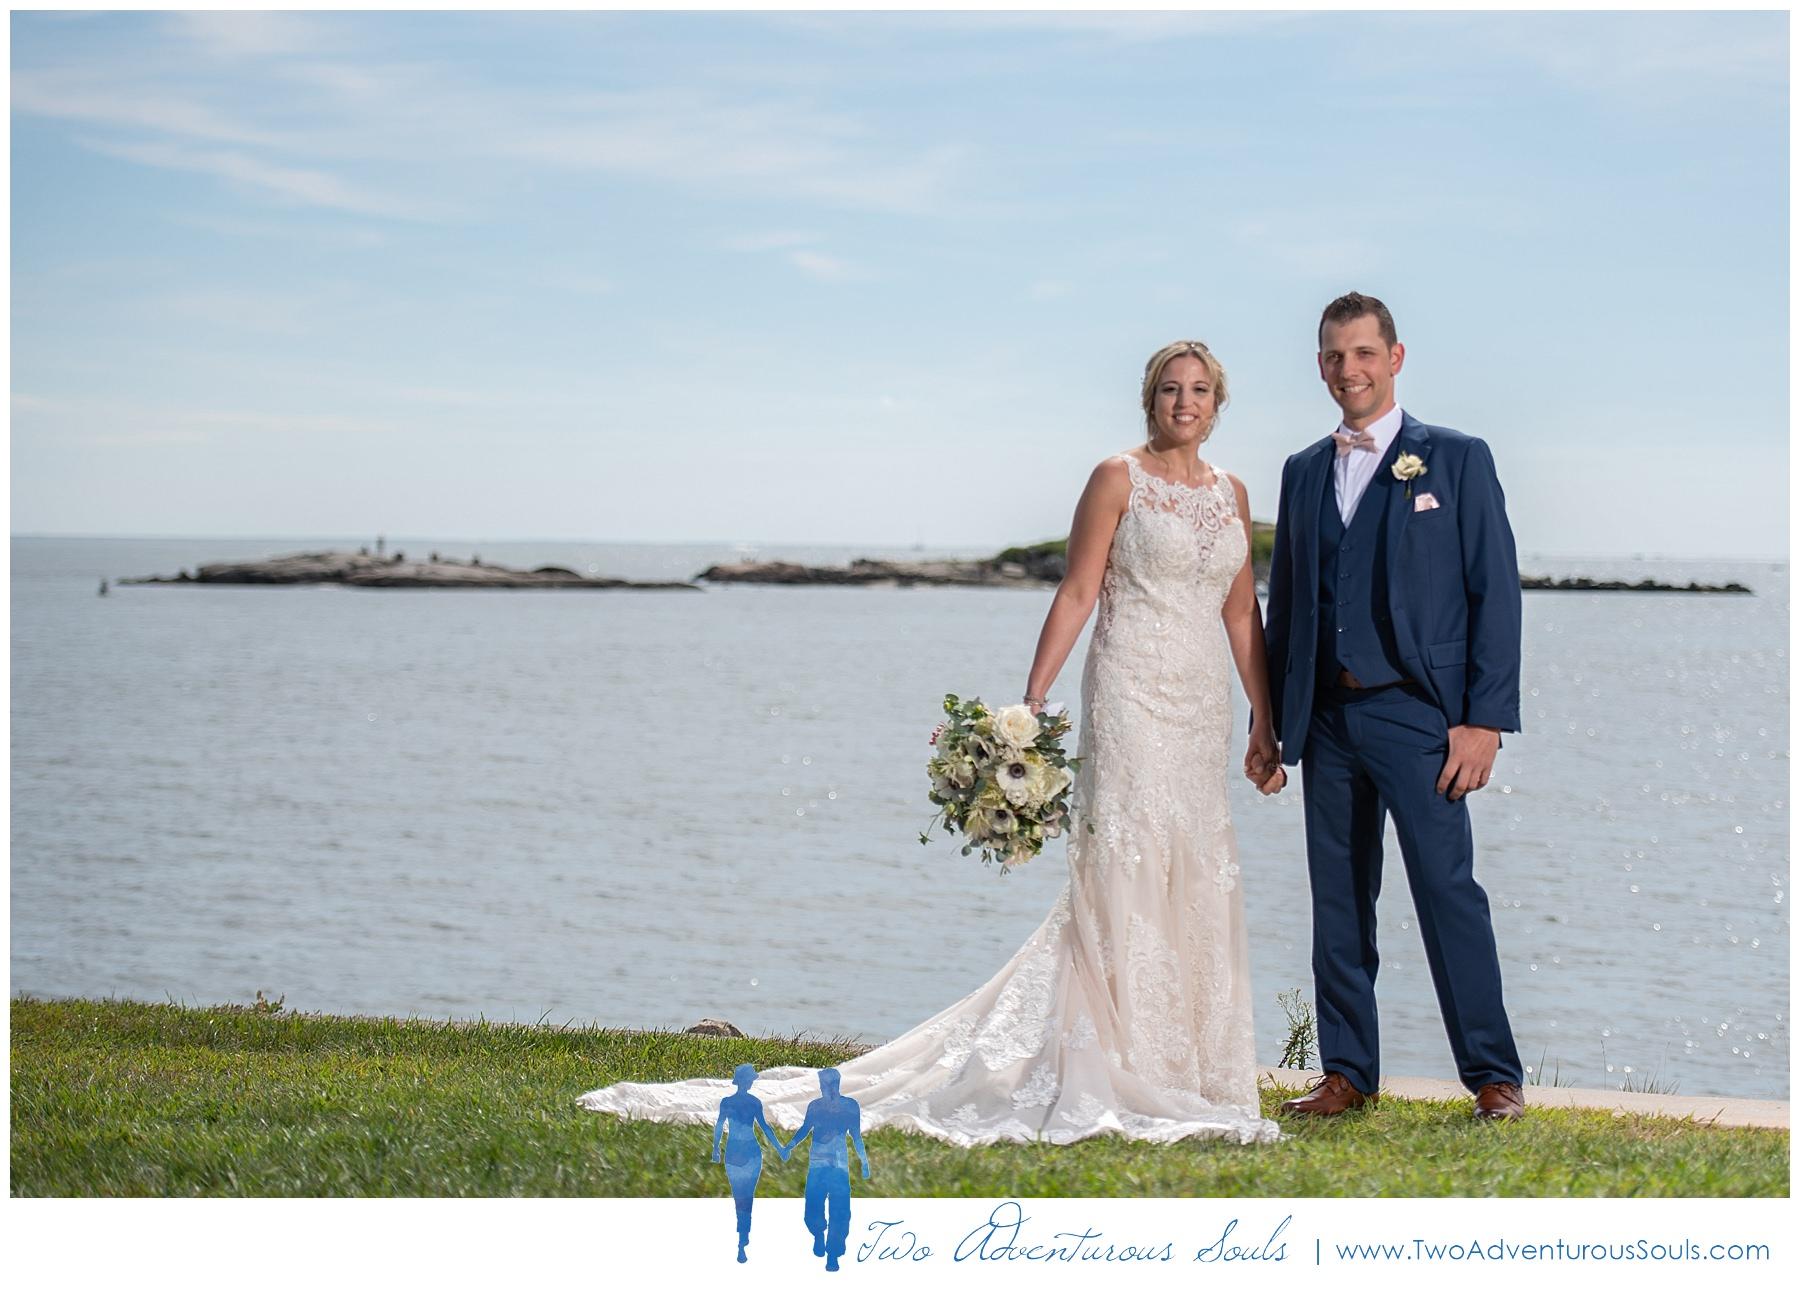 Connecticut Wedding Photographers, Lace Factory Wedding Photographers, Two Adventurous Souls - 083119_0024.jpg